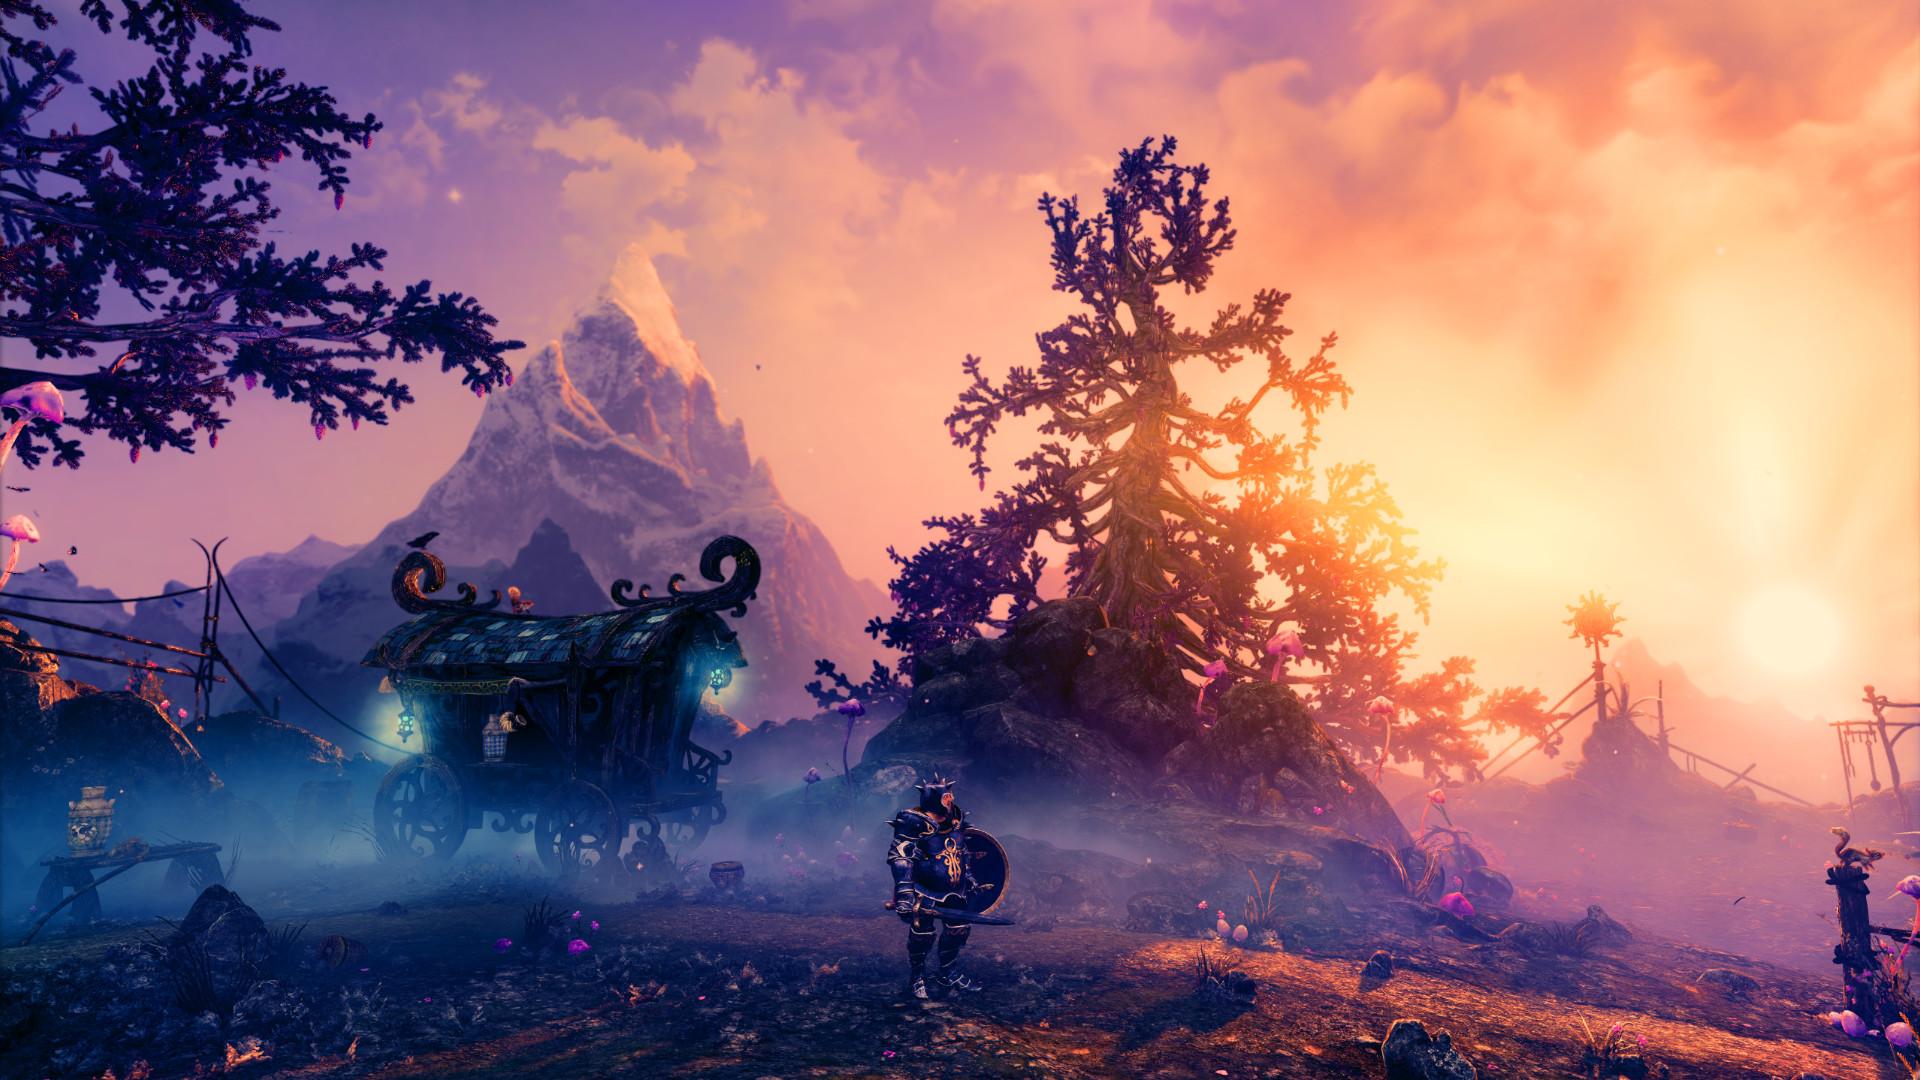 Trine 3: The Artifacts of Power screenshot